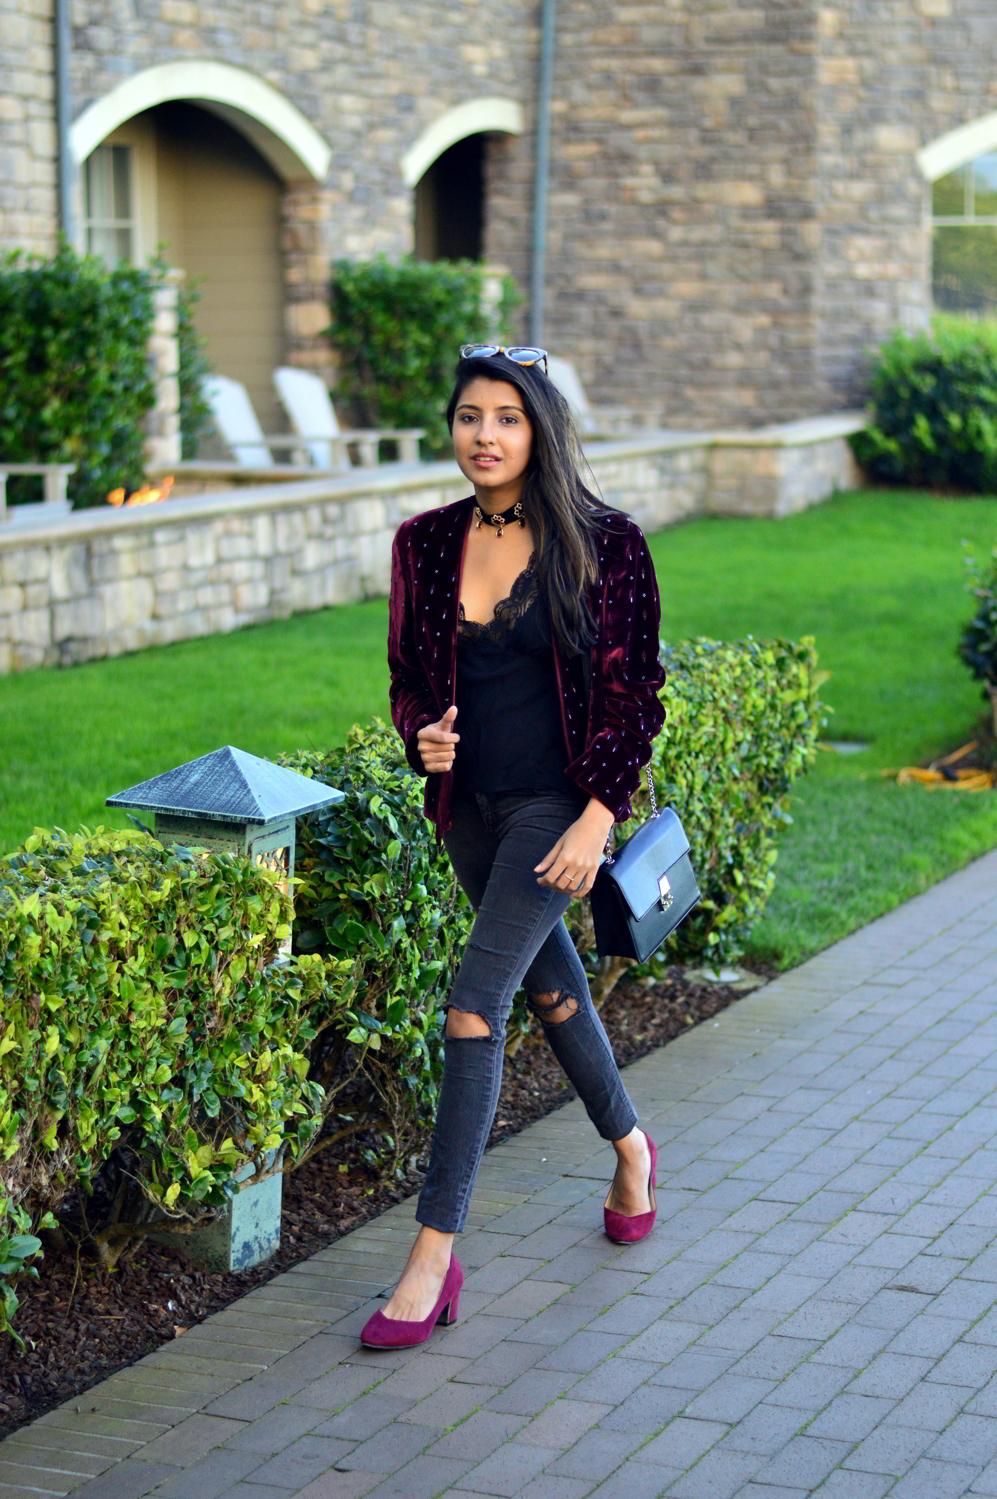 velvet-embellished-blazer-holiday-party-style-burgundy-black-blogger-outfit 1